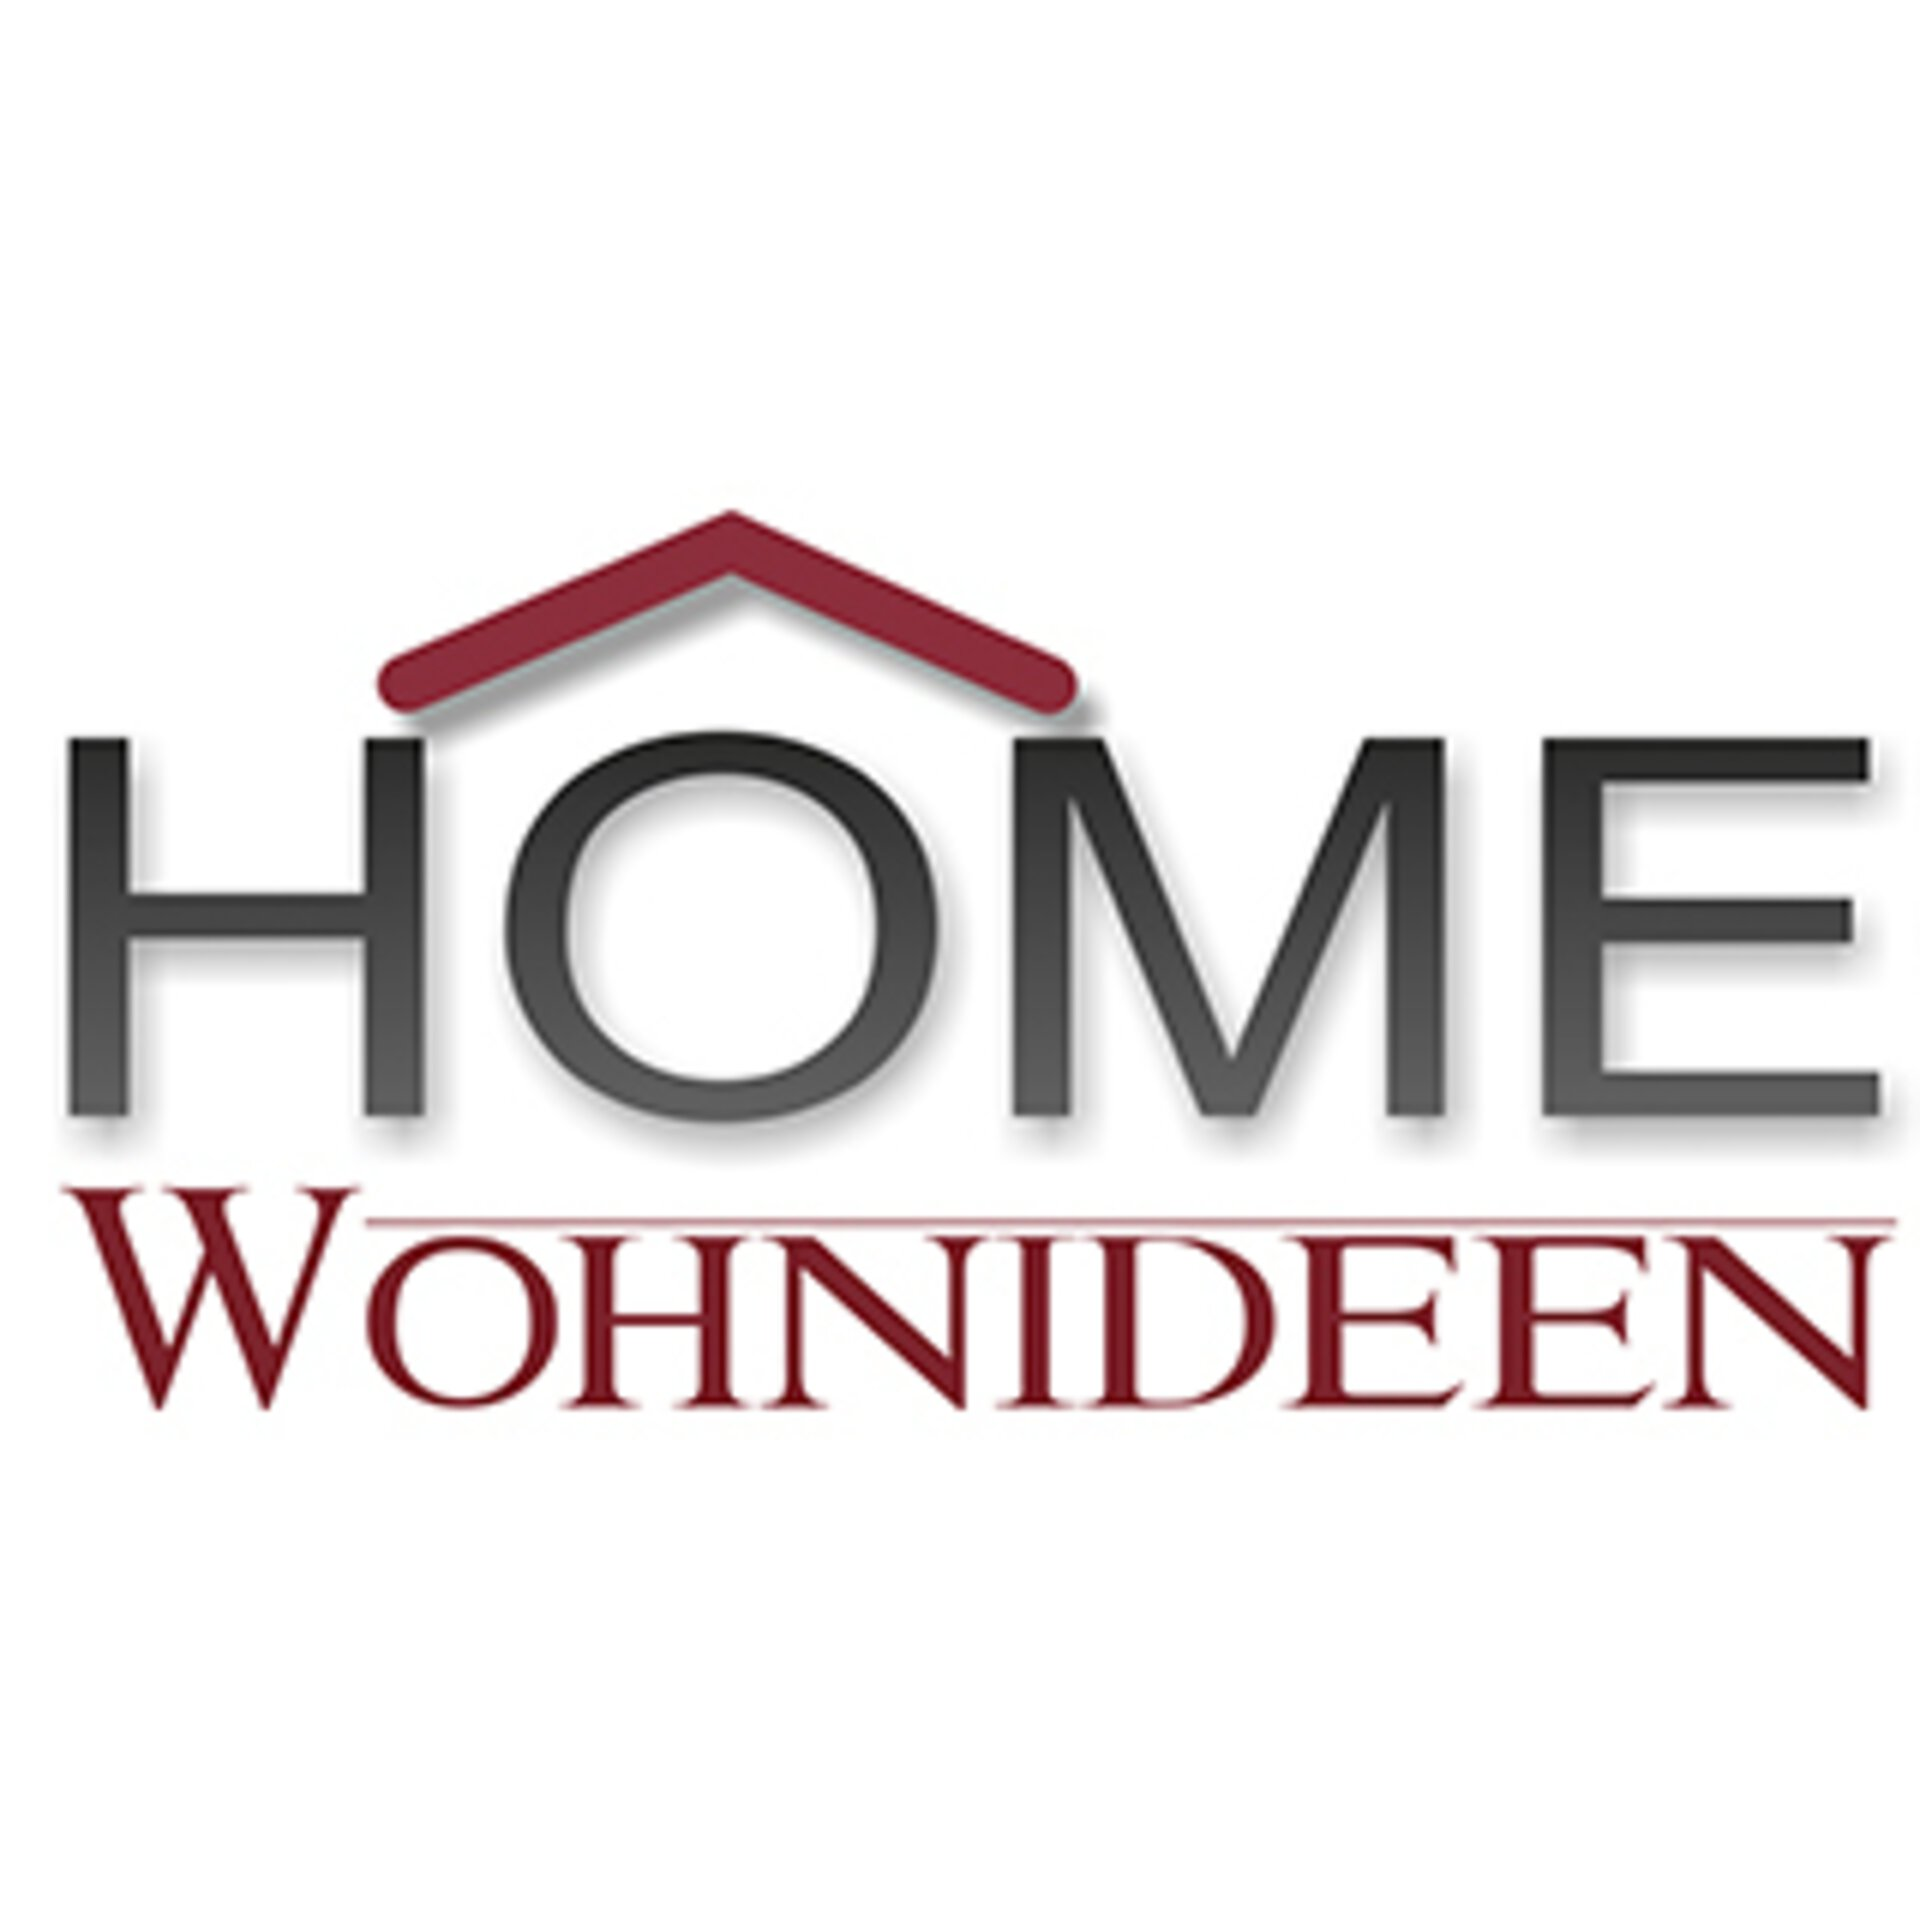 Home Wohnideen